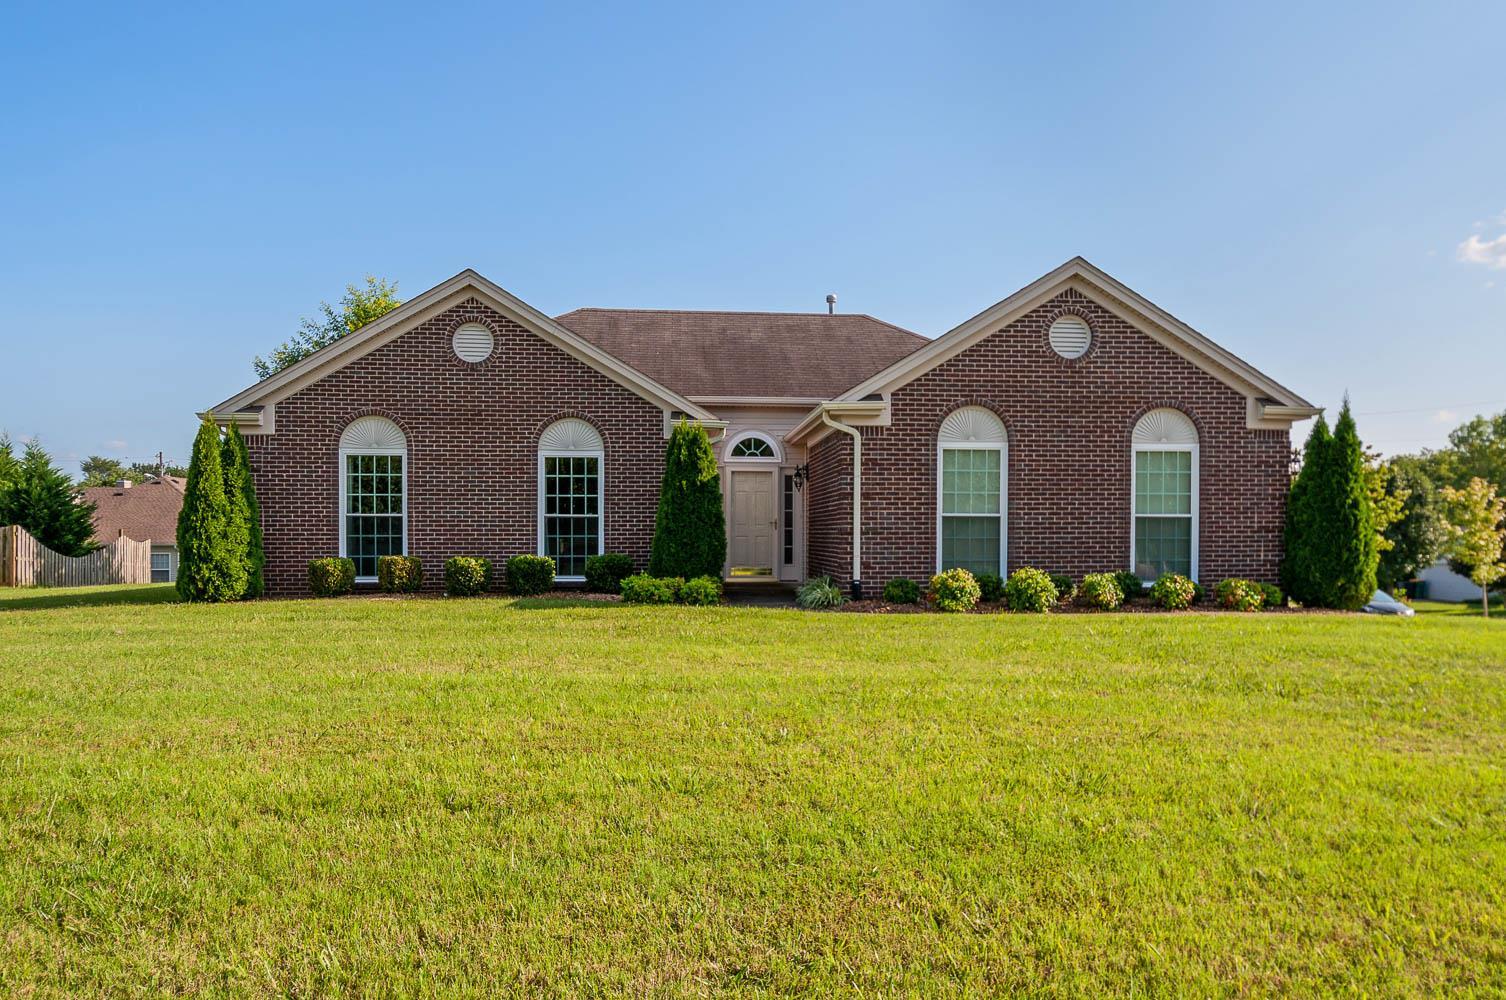 3302 Haynes Dr, Spring Hill, TN 37174 - Spring Hill, TN real estate listing